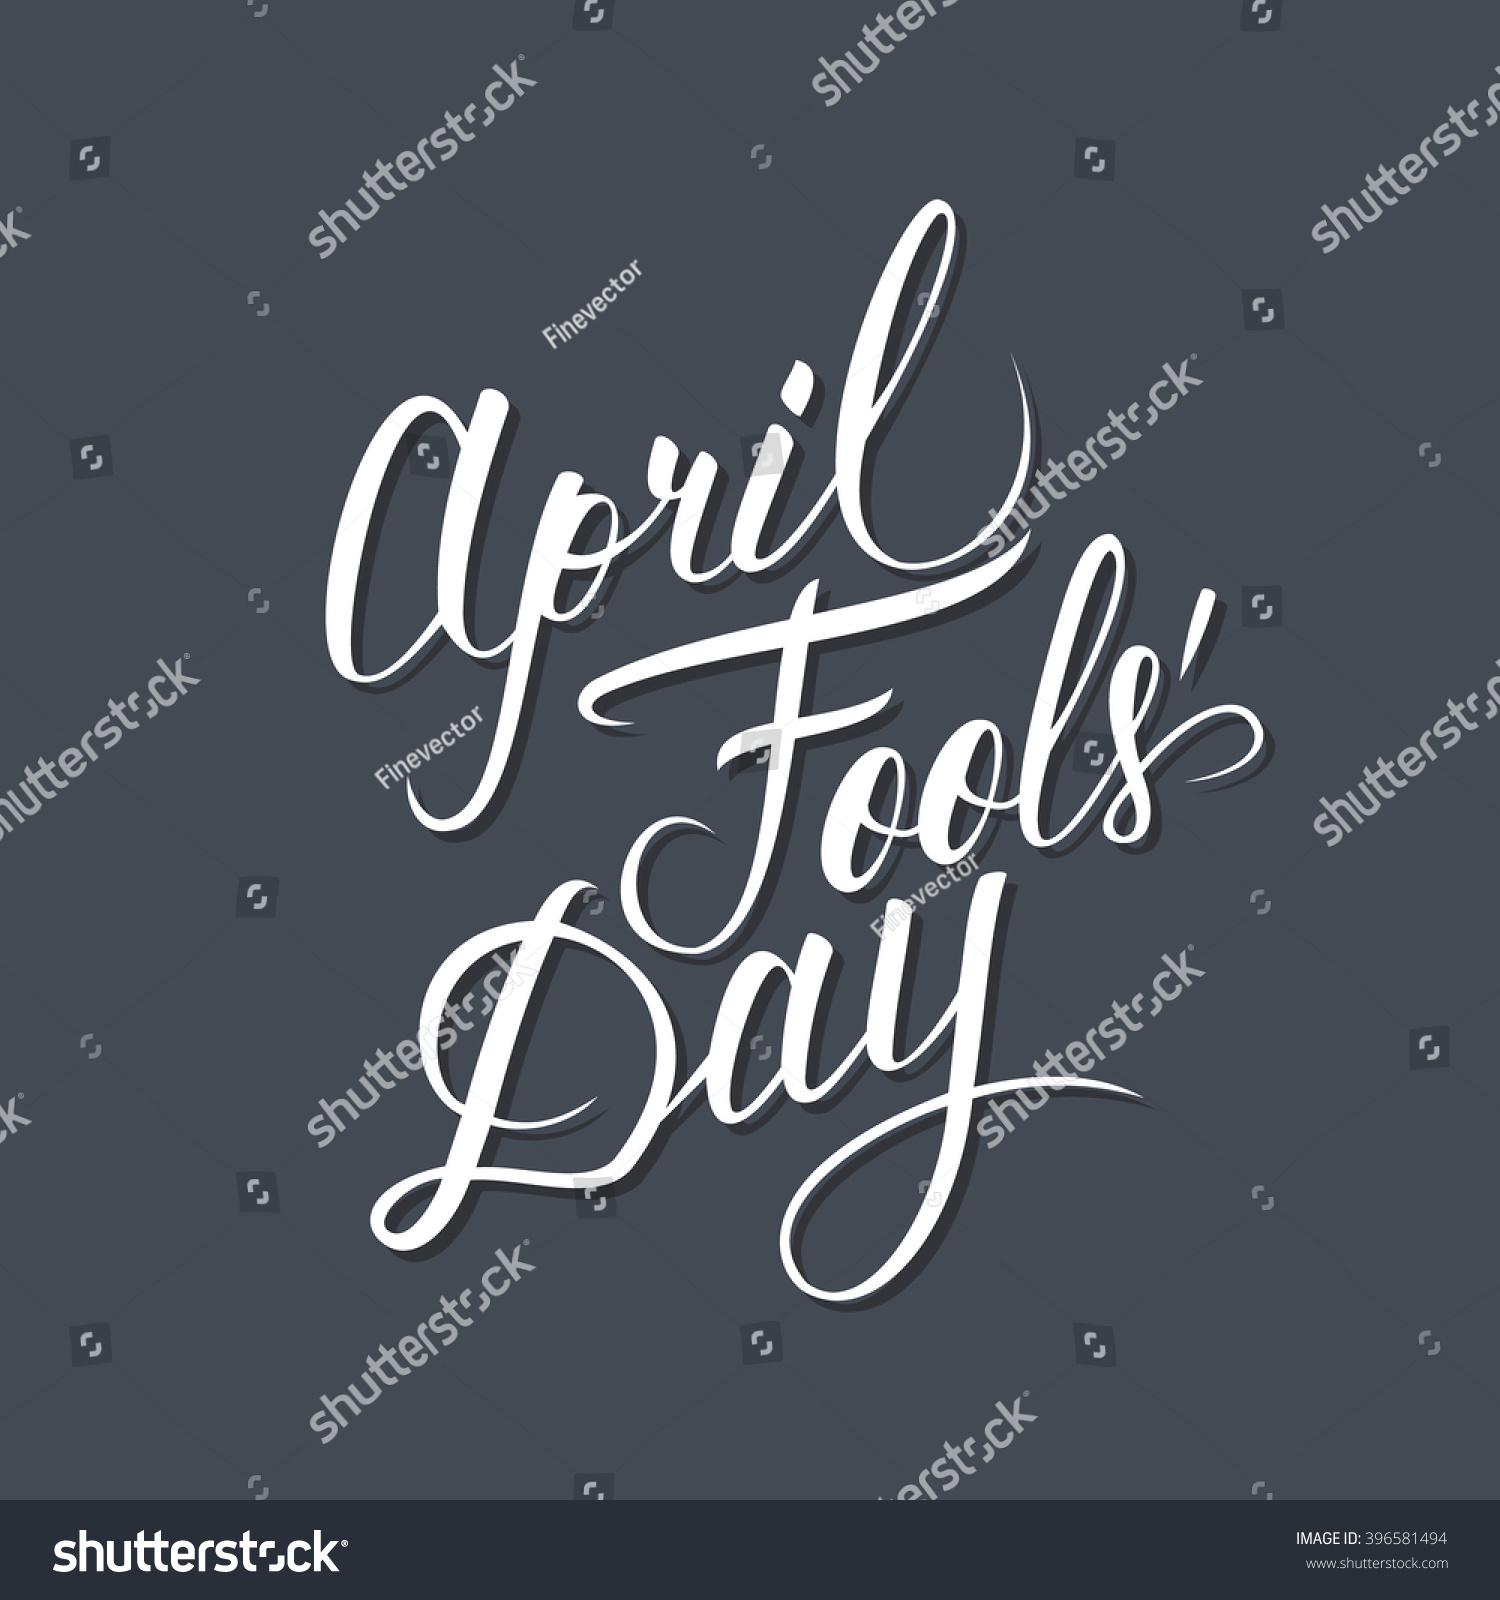 april fools day card handwritten inscription hand drawn lettering april fools day calligraphy